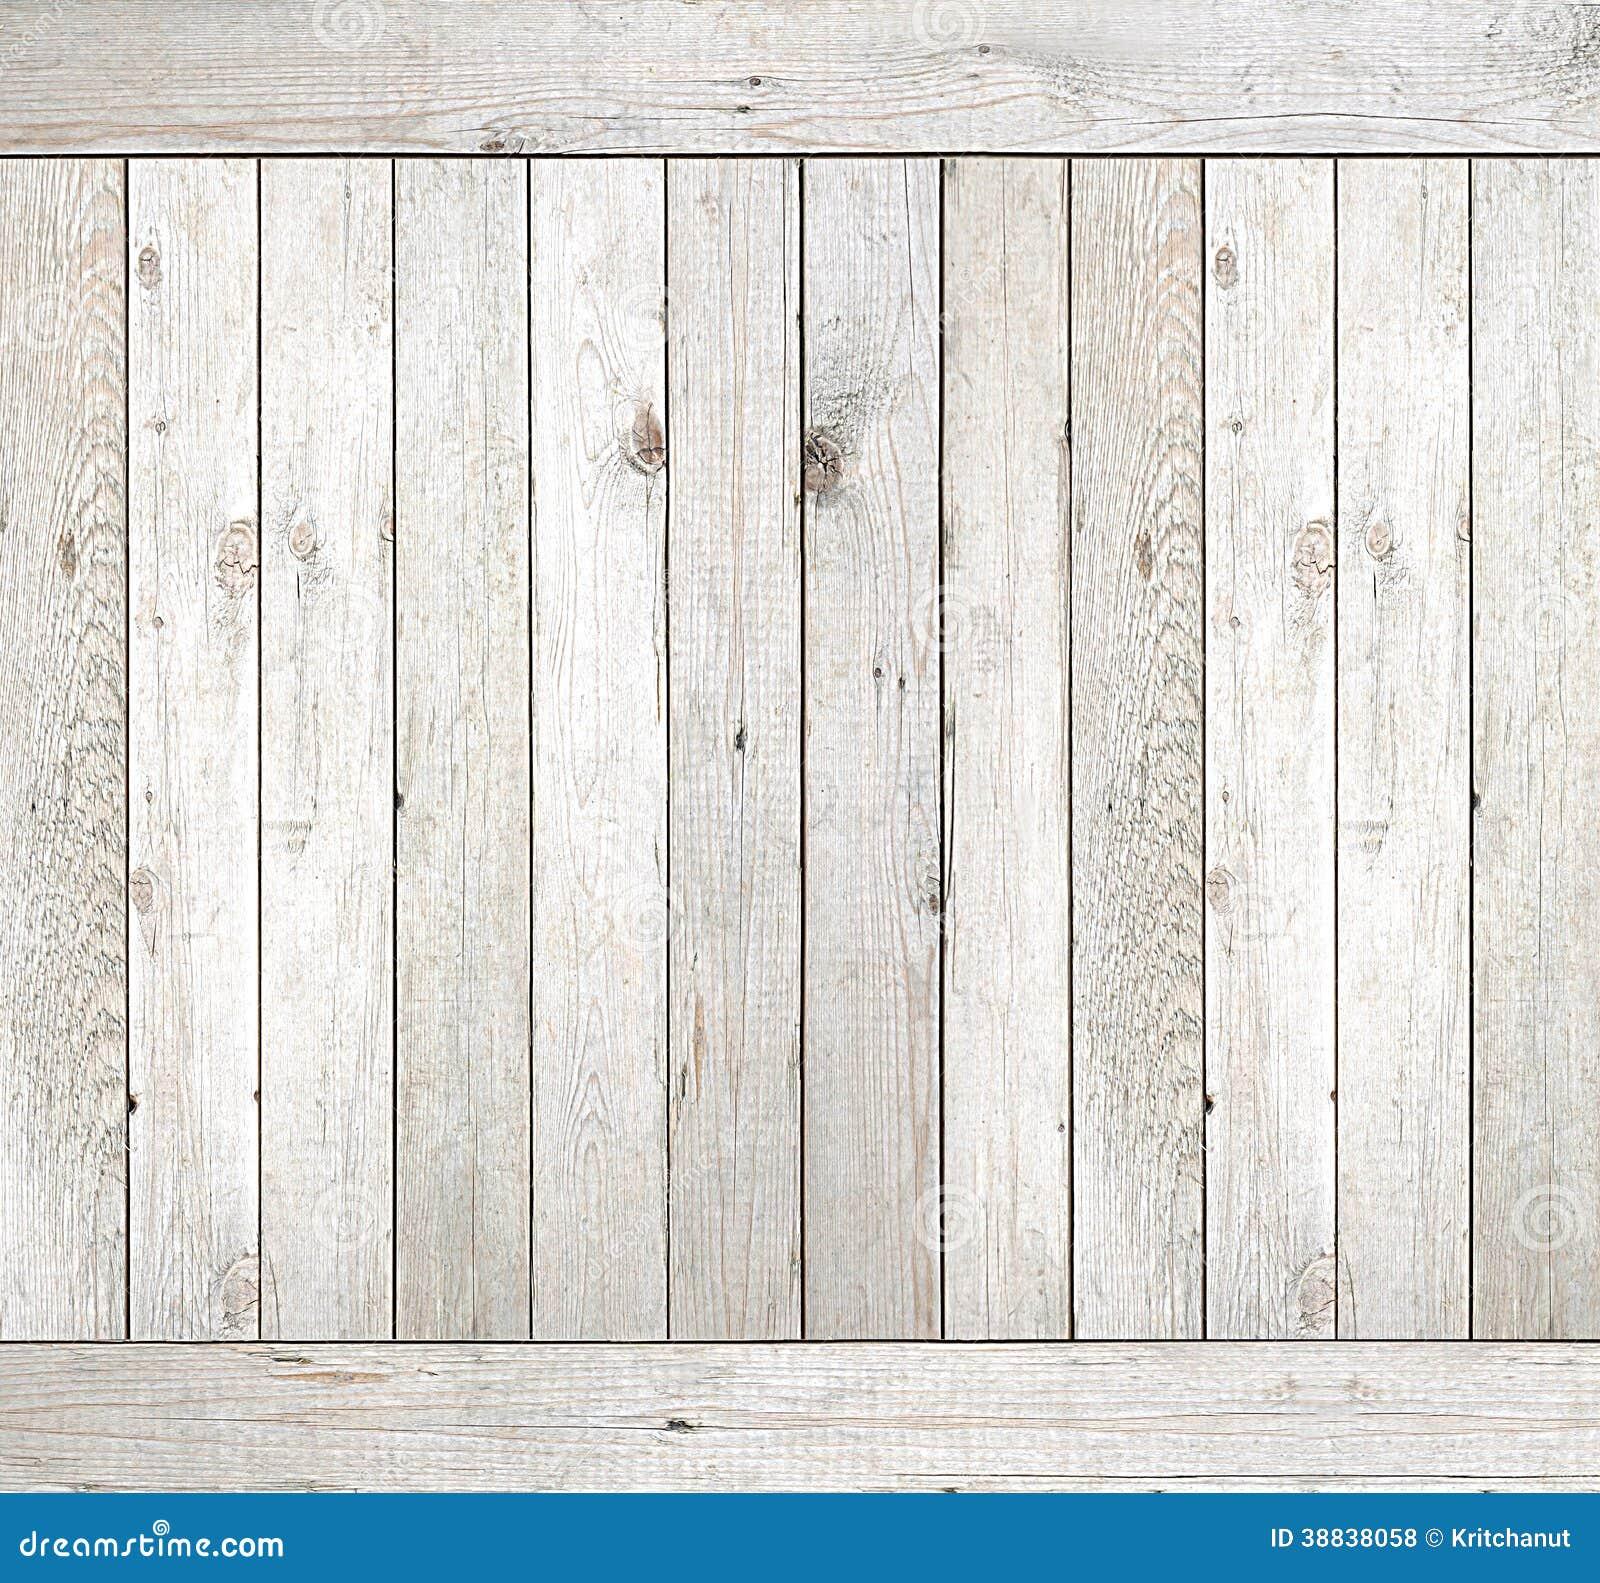 Image Bois Clair : Light Wood Planks Texture